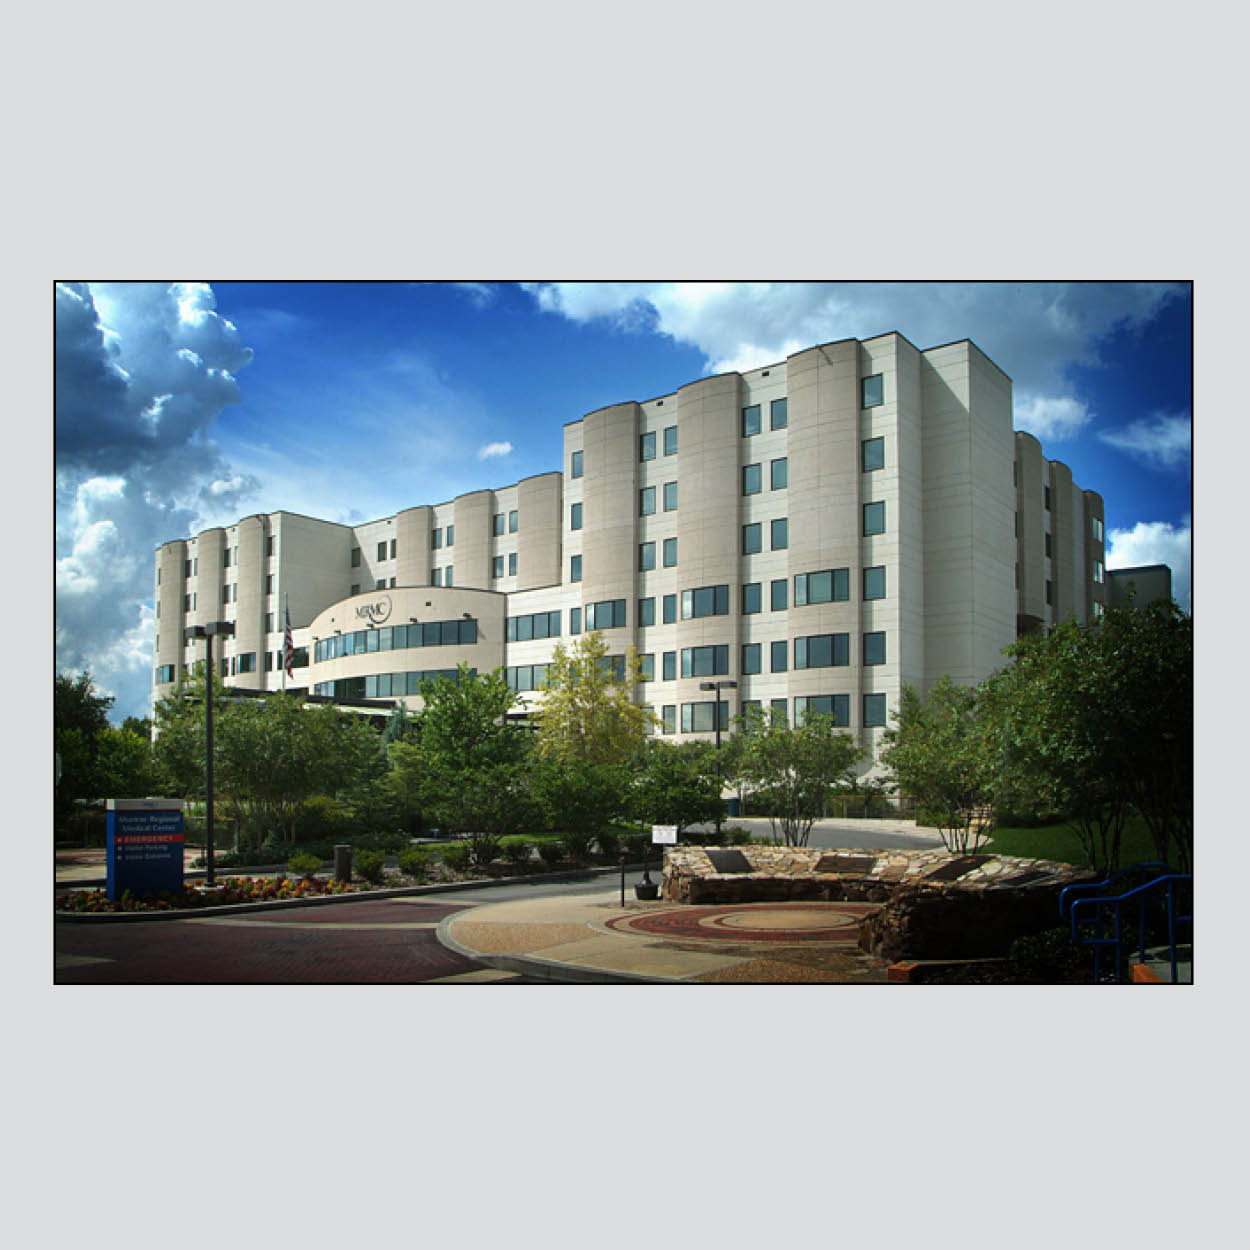 munroe-regional-medical-center